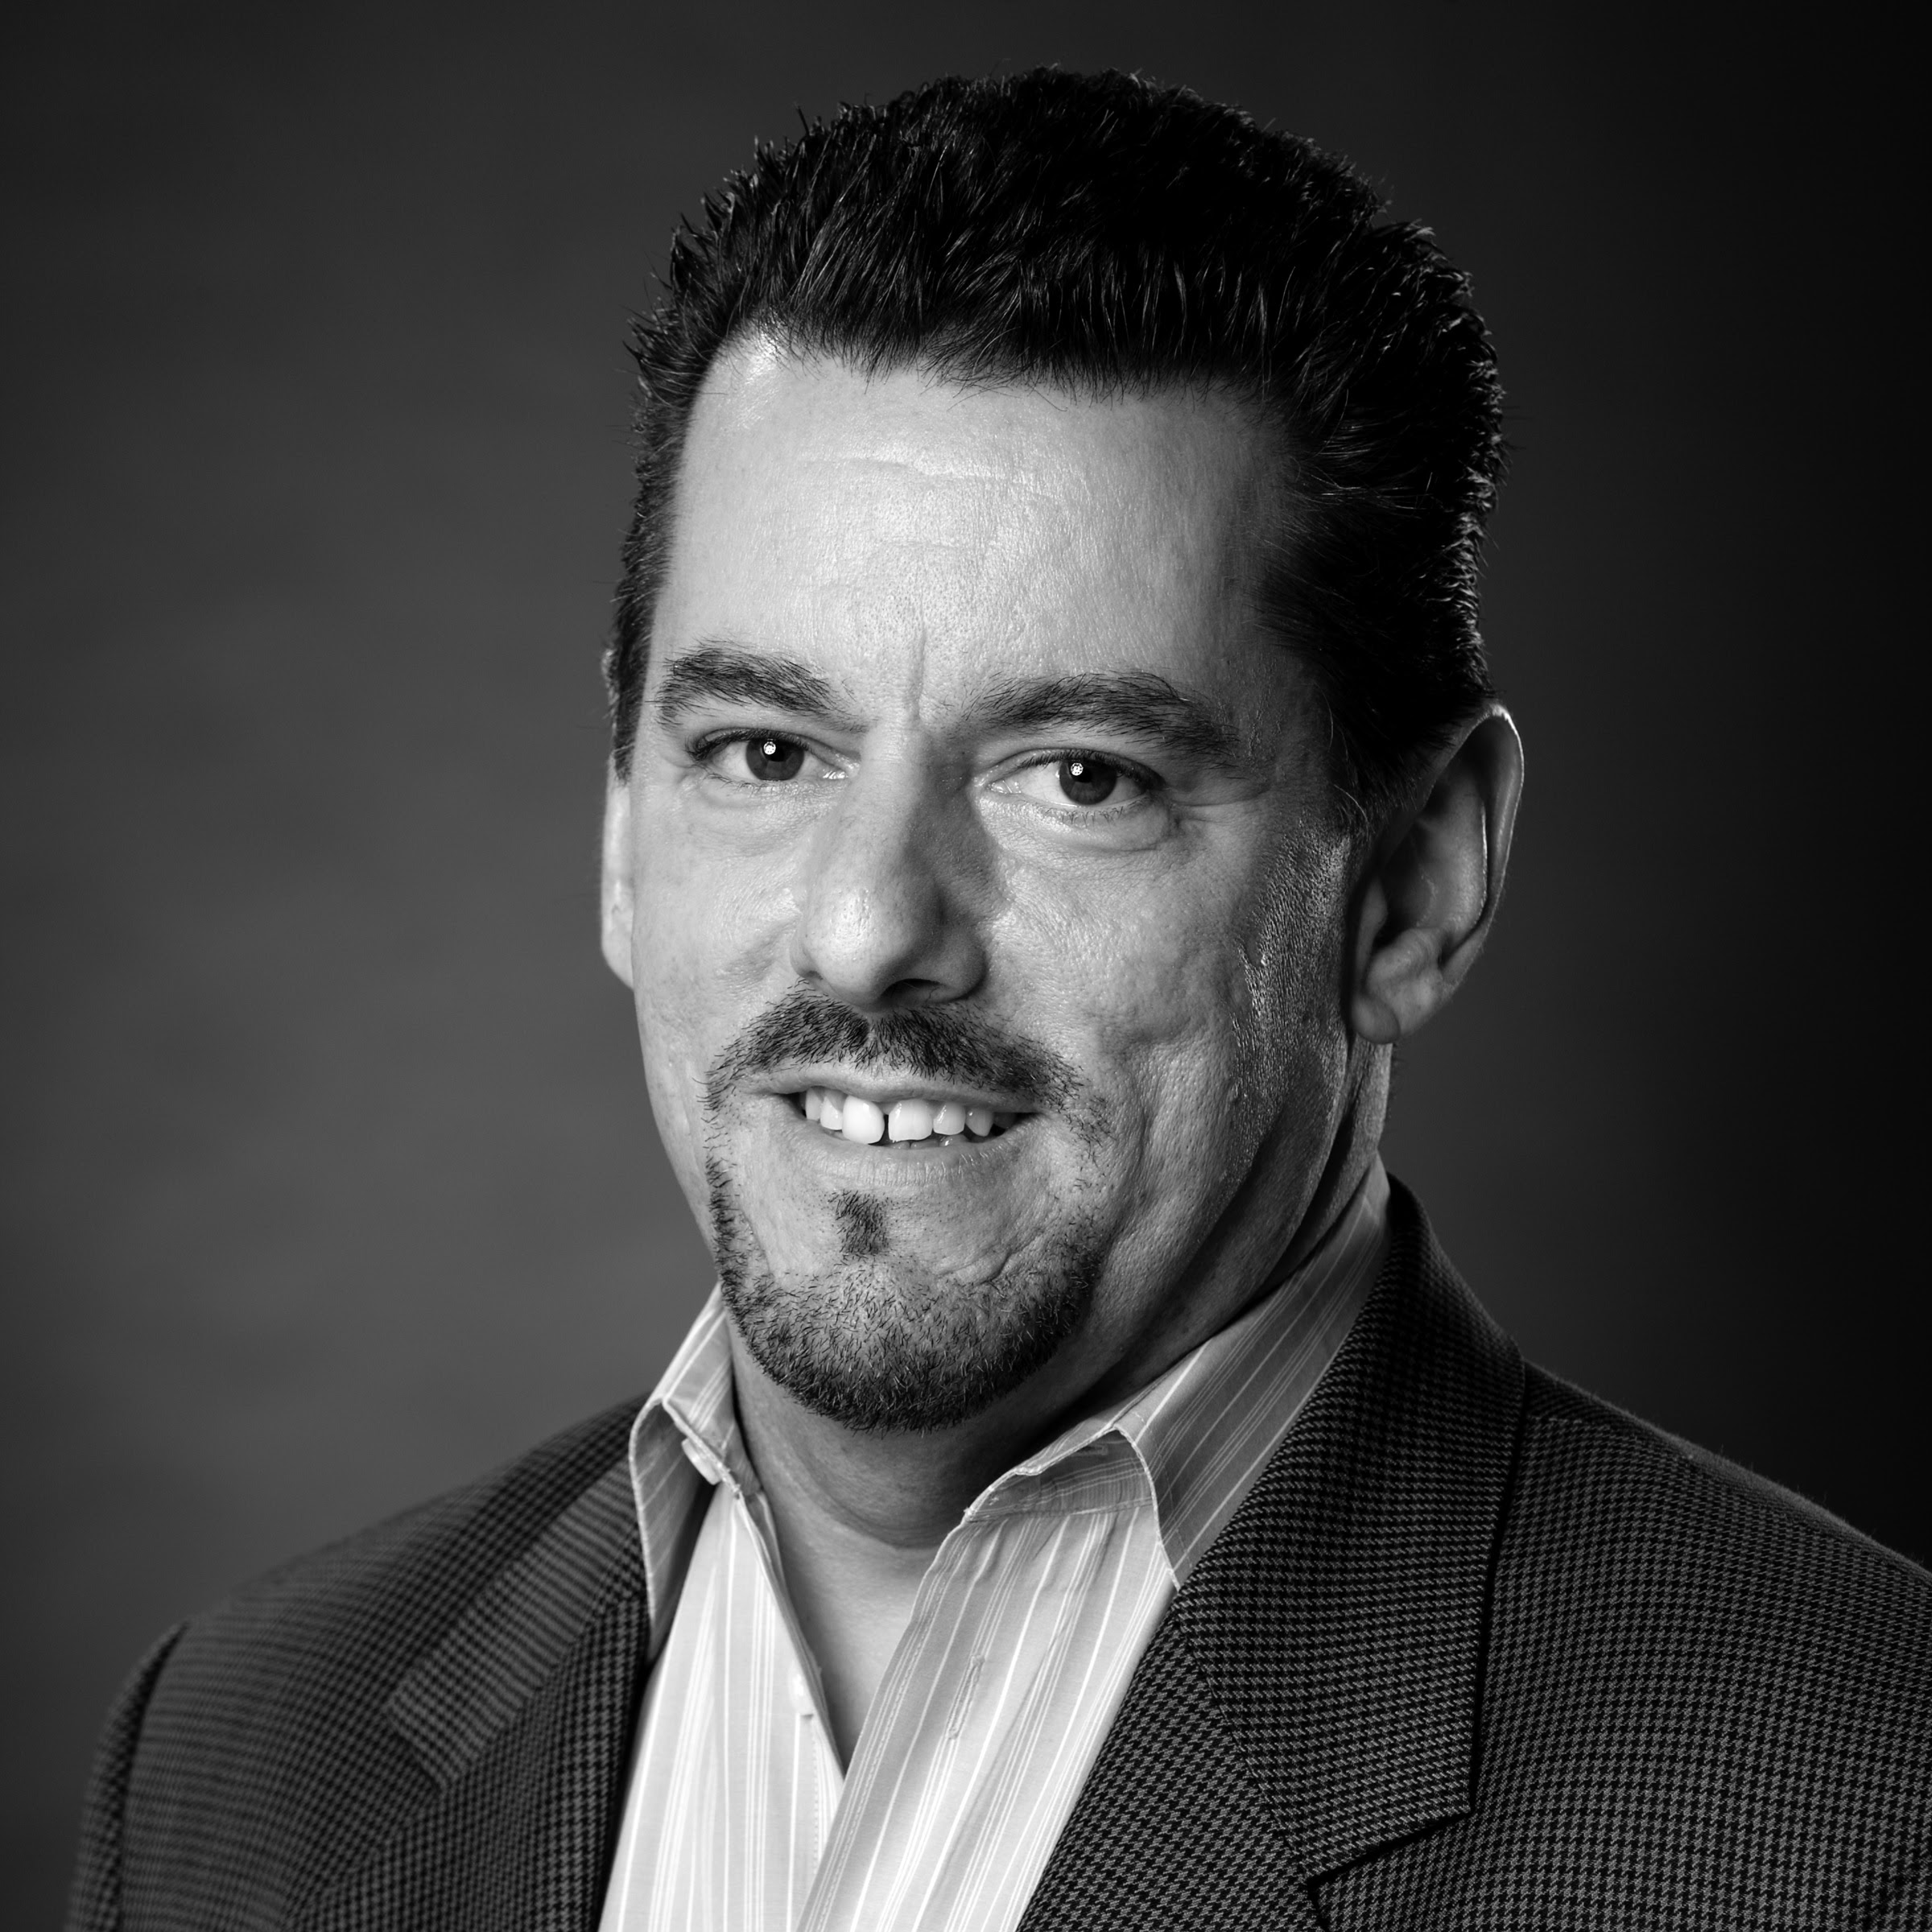 Antonio Valdés, Chief Executive Officer, Children's Crisis Treatment Center